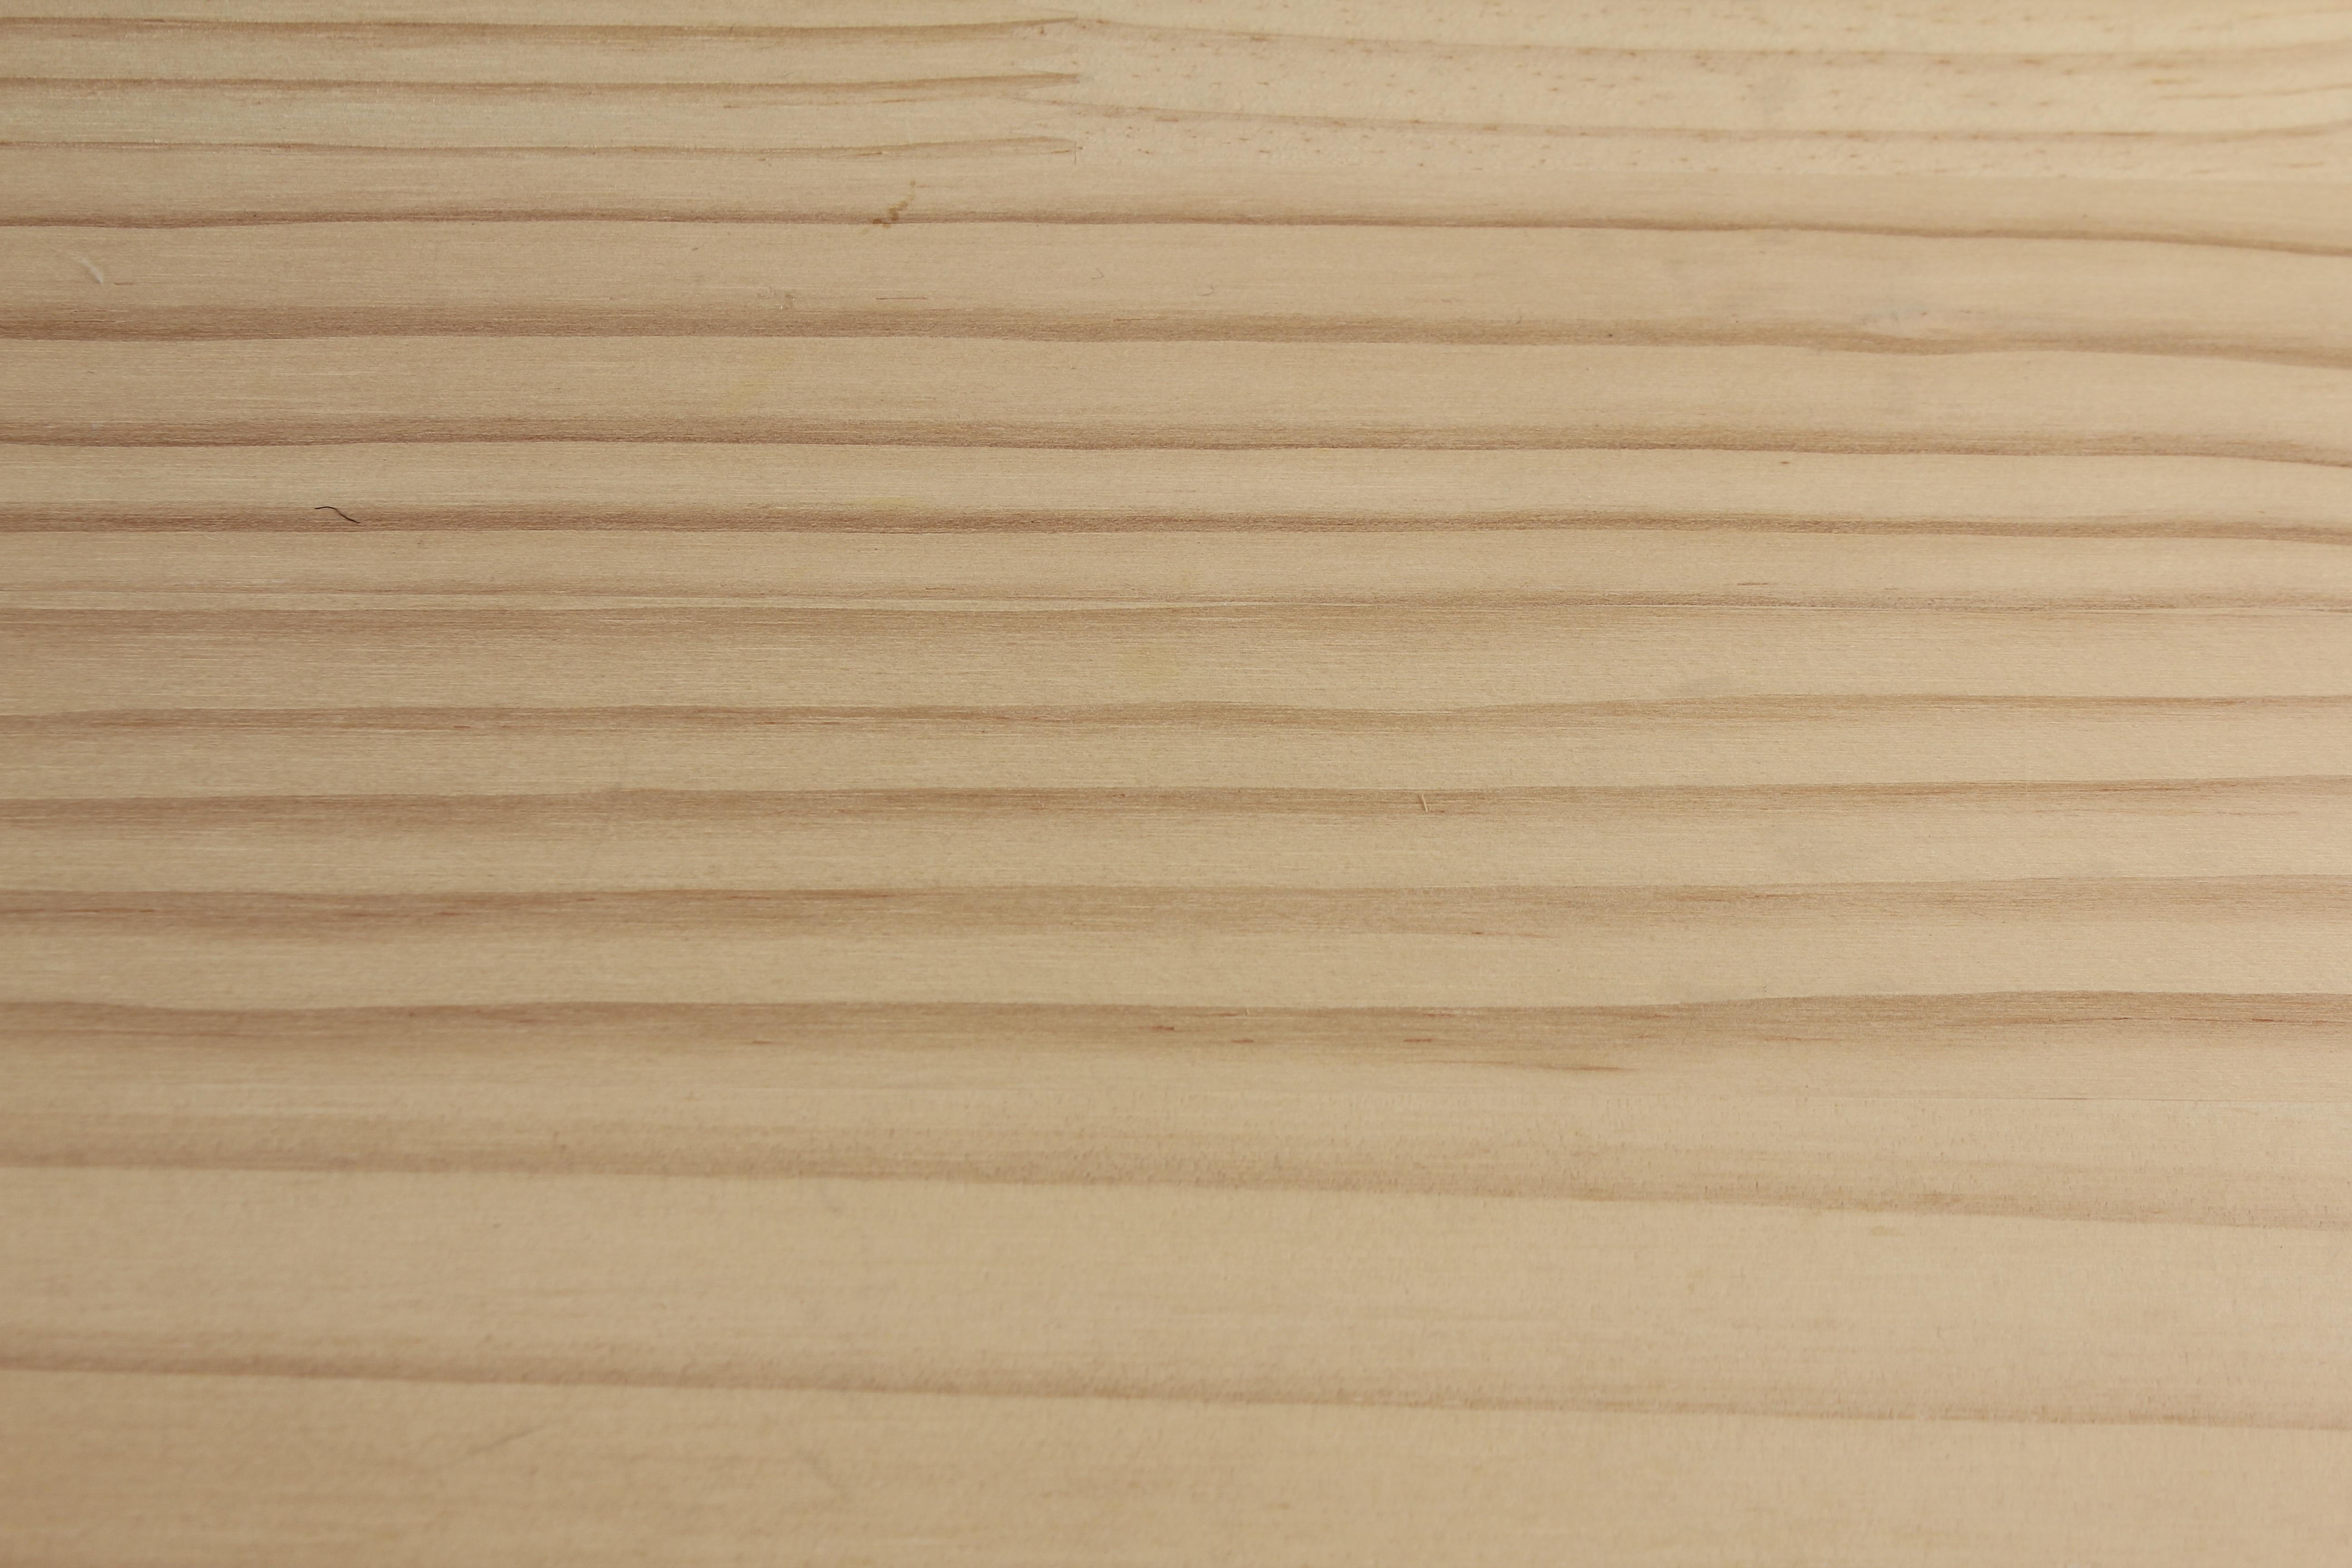 Gambar Tekstur Papan Lantai Pedalaman Kulit Liar